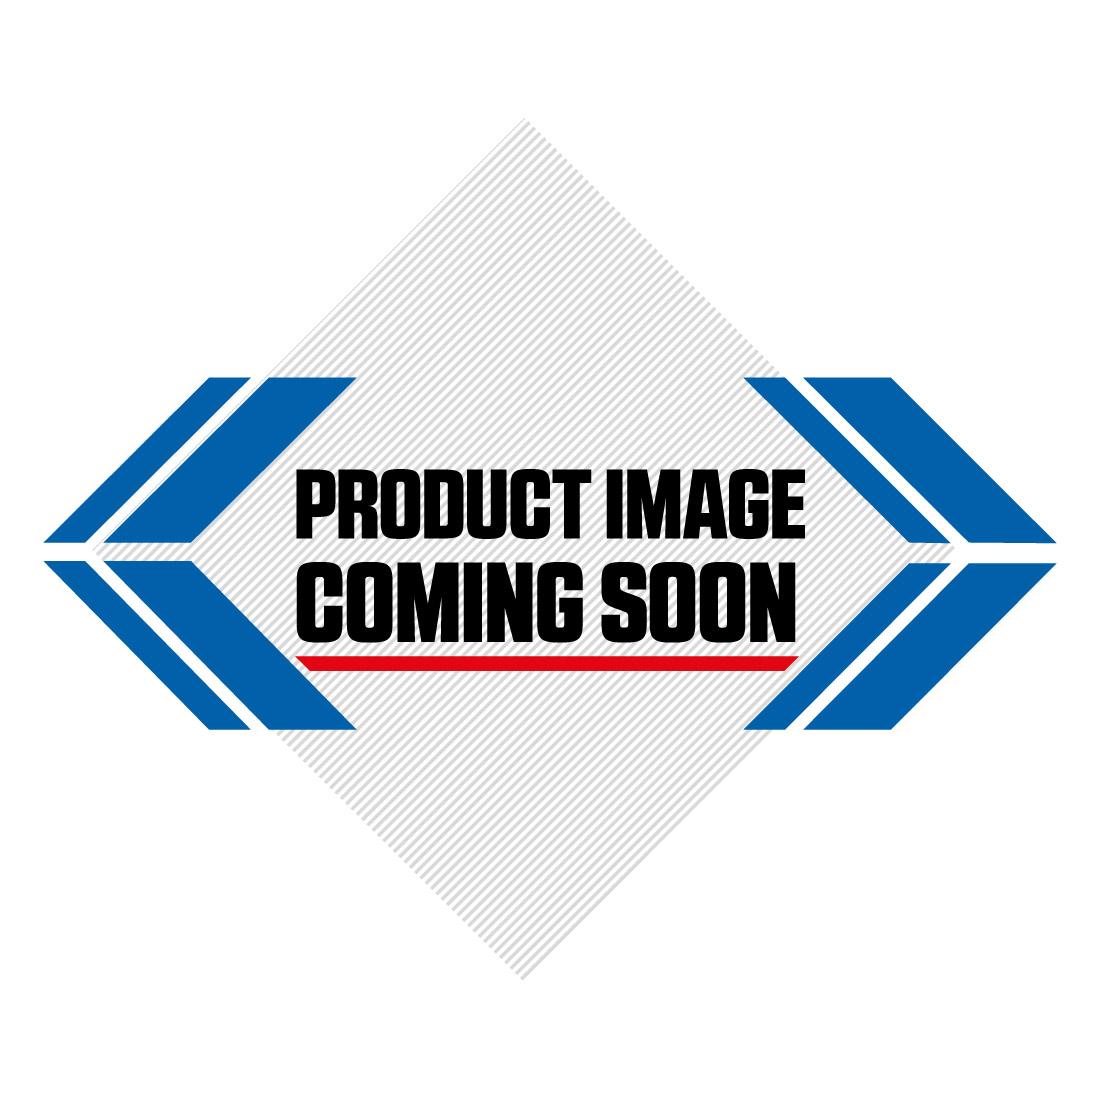 2019 UFO Interceptor 2 Helmet - Galaxy Limited Edition Image-3